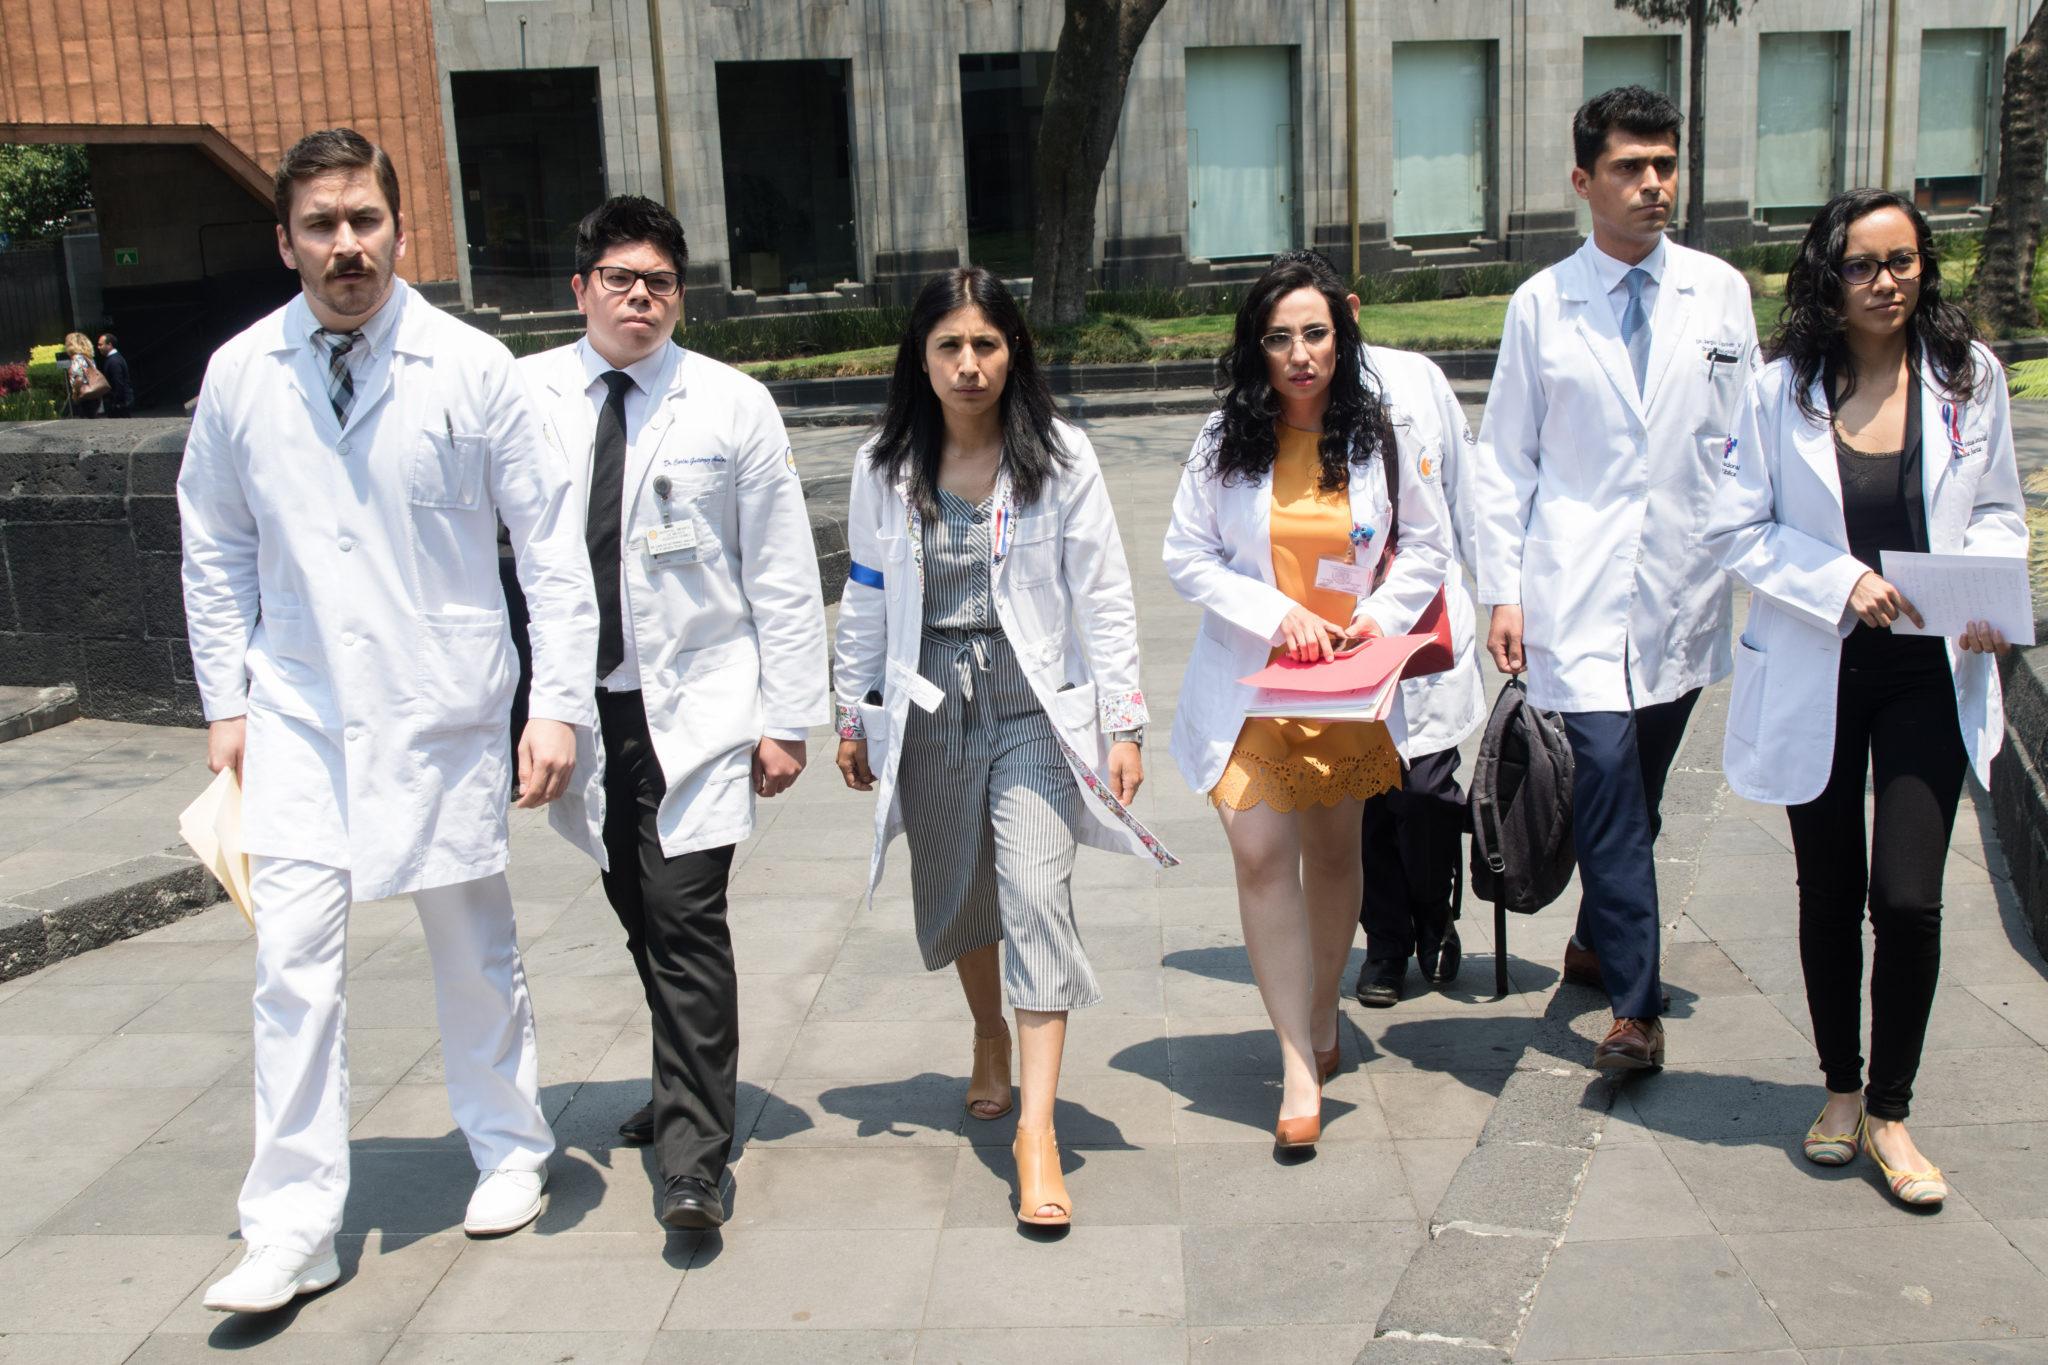 médicos residentes, quincenas, paro de labores, hospitales,